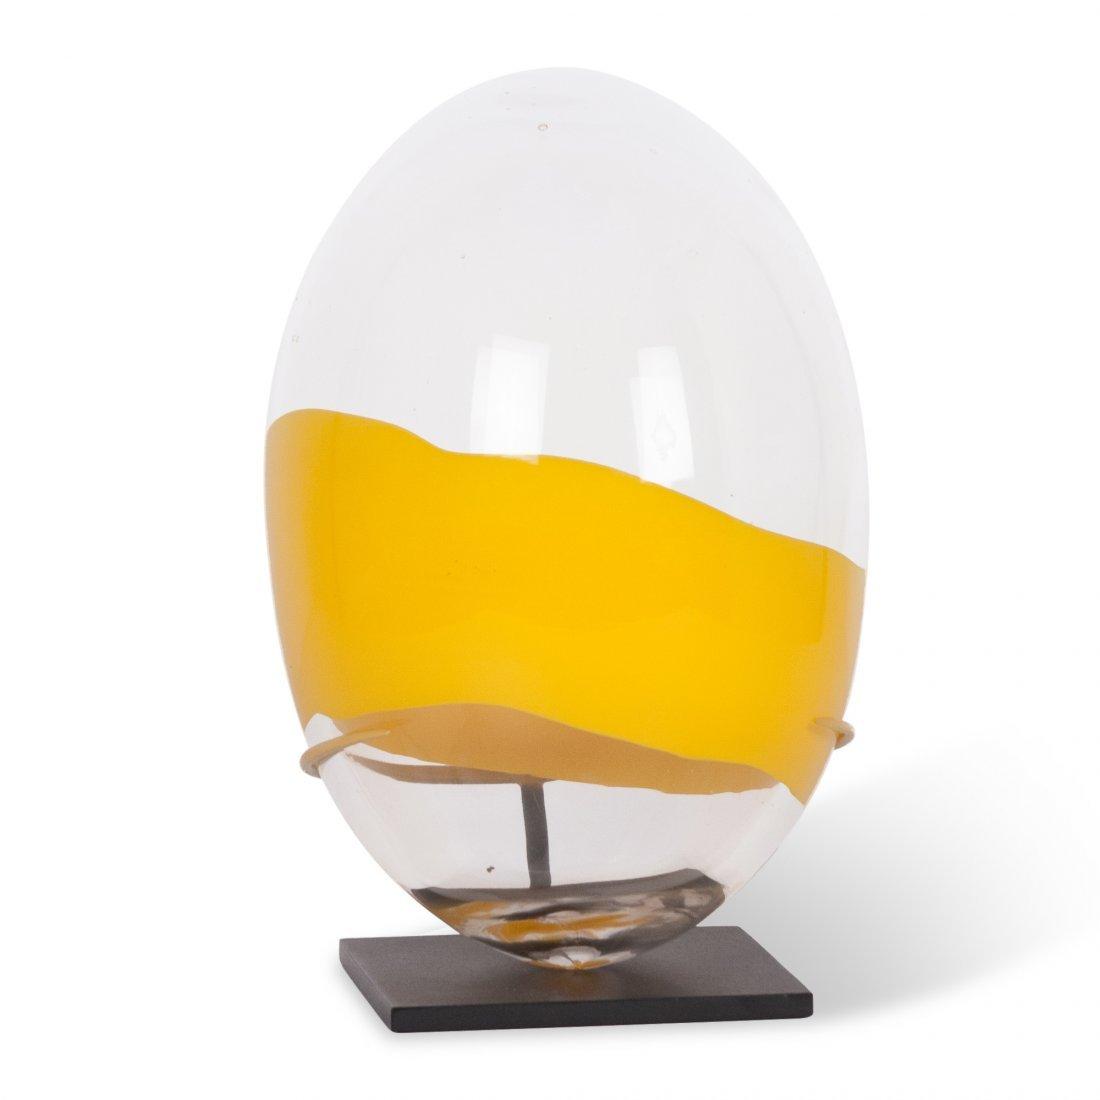 Santillana for Venini for Pierre Cardin Glass Egg - 6